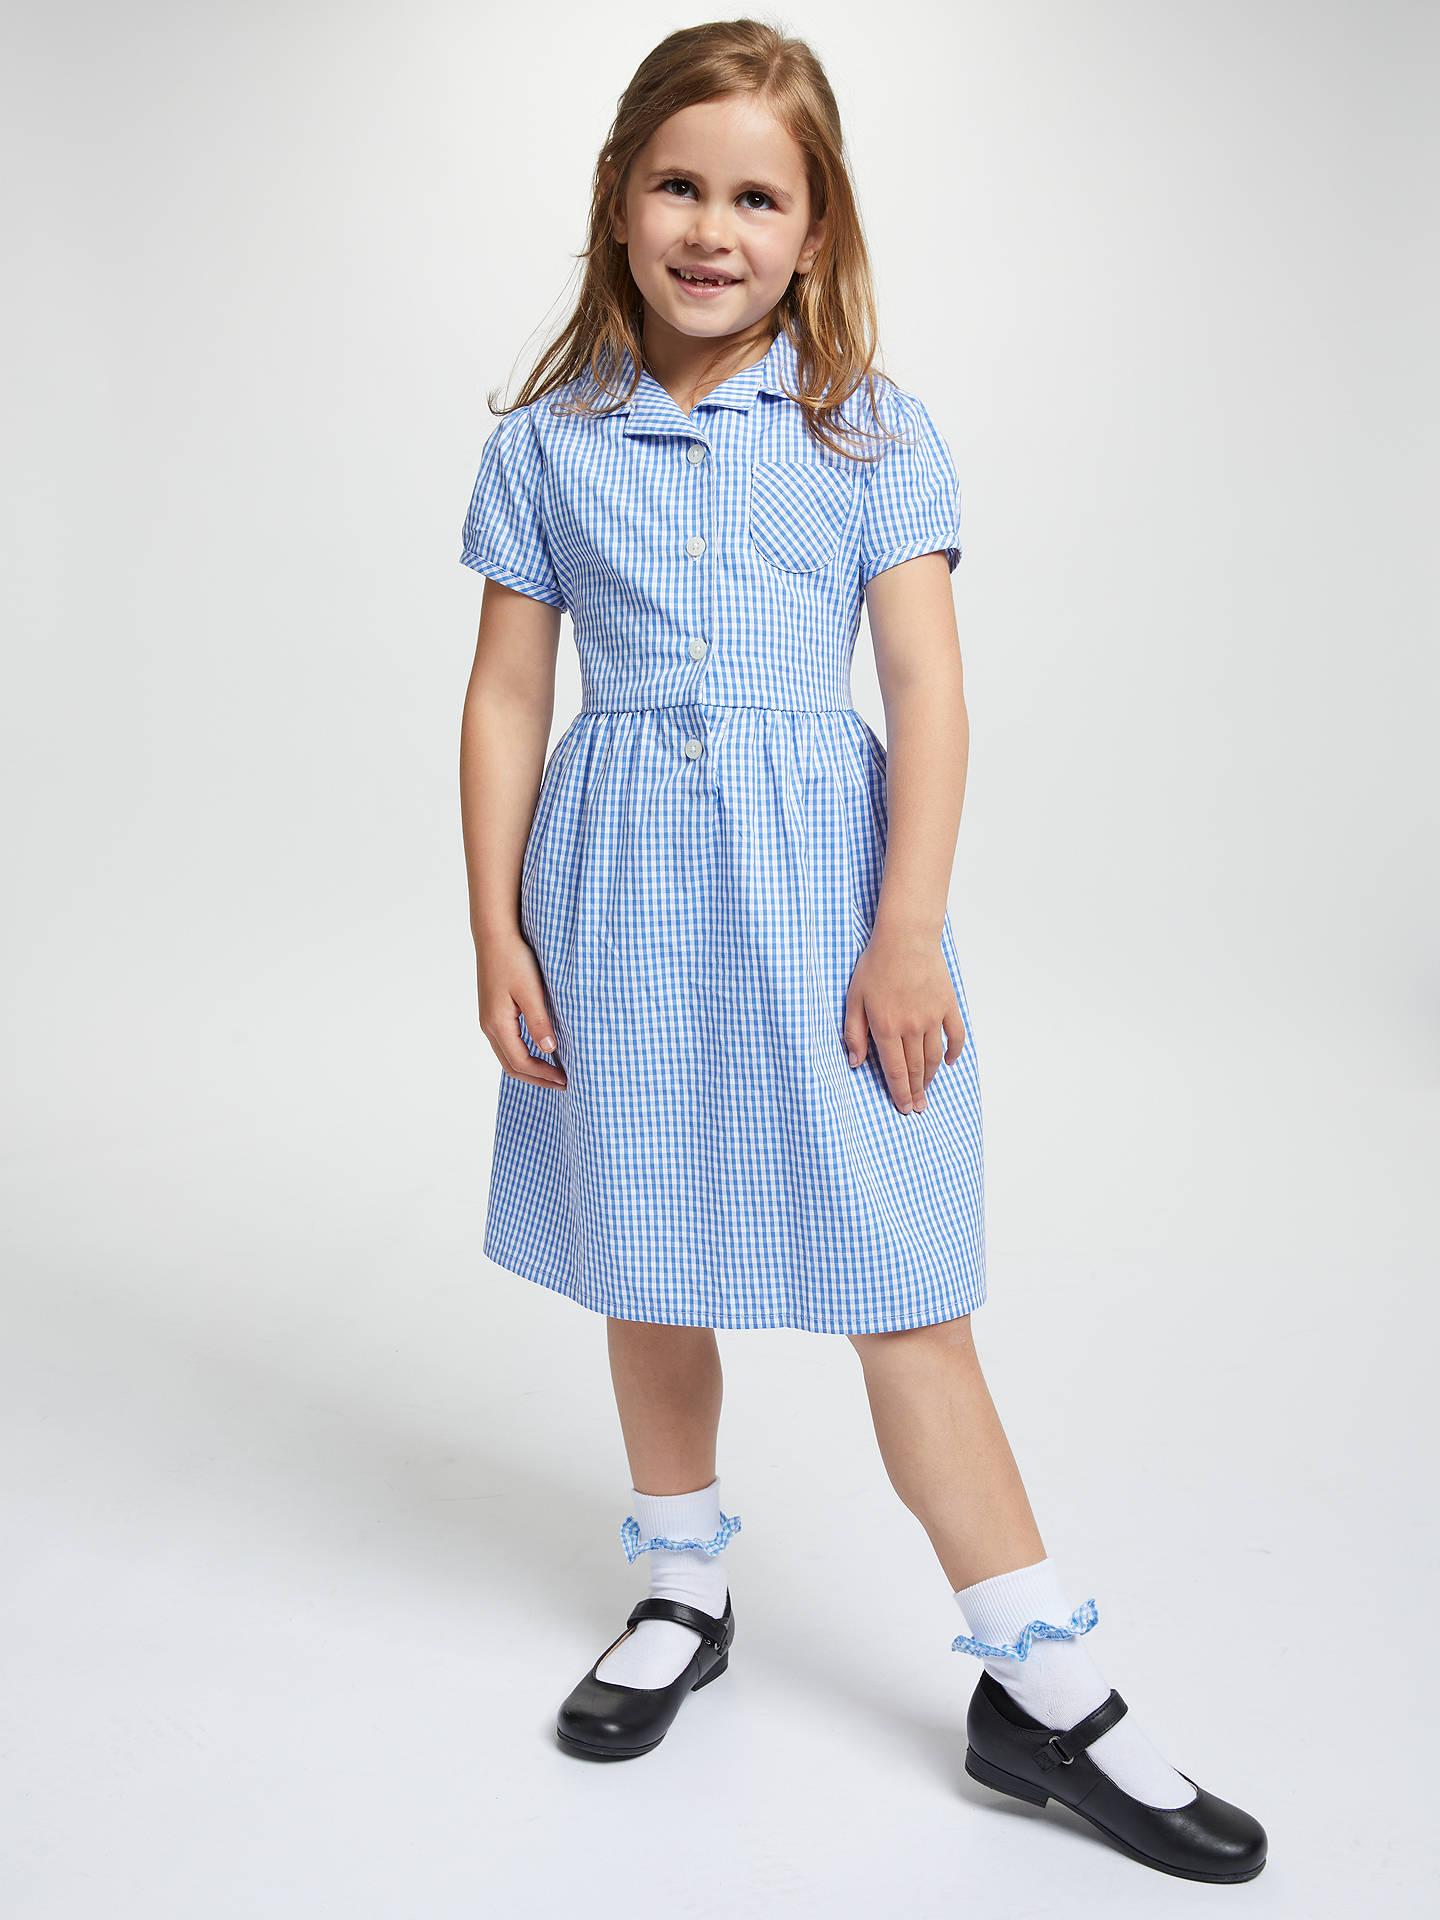 girl summer uniform school gingham summer skirt